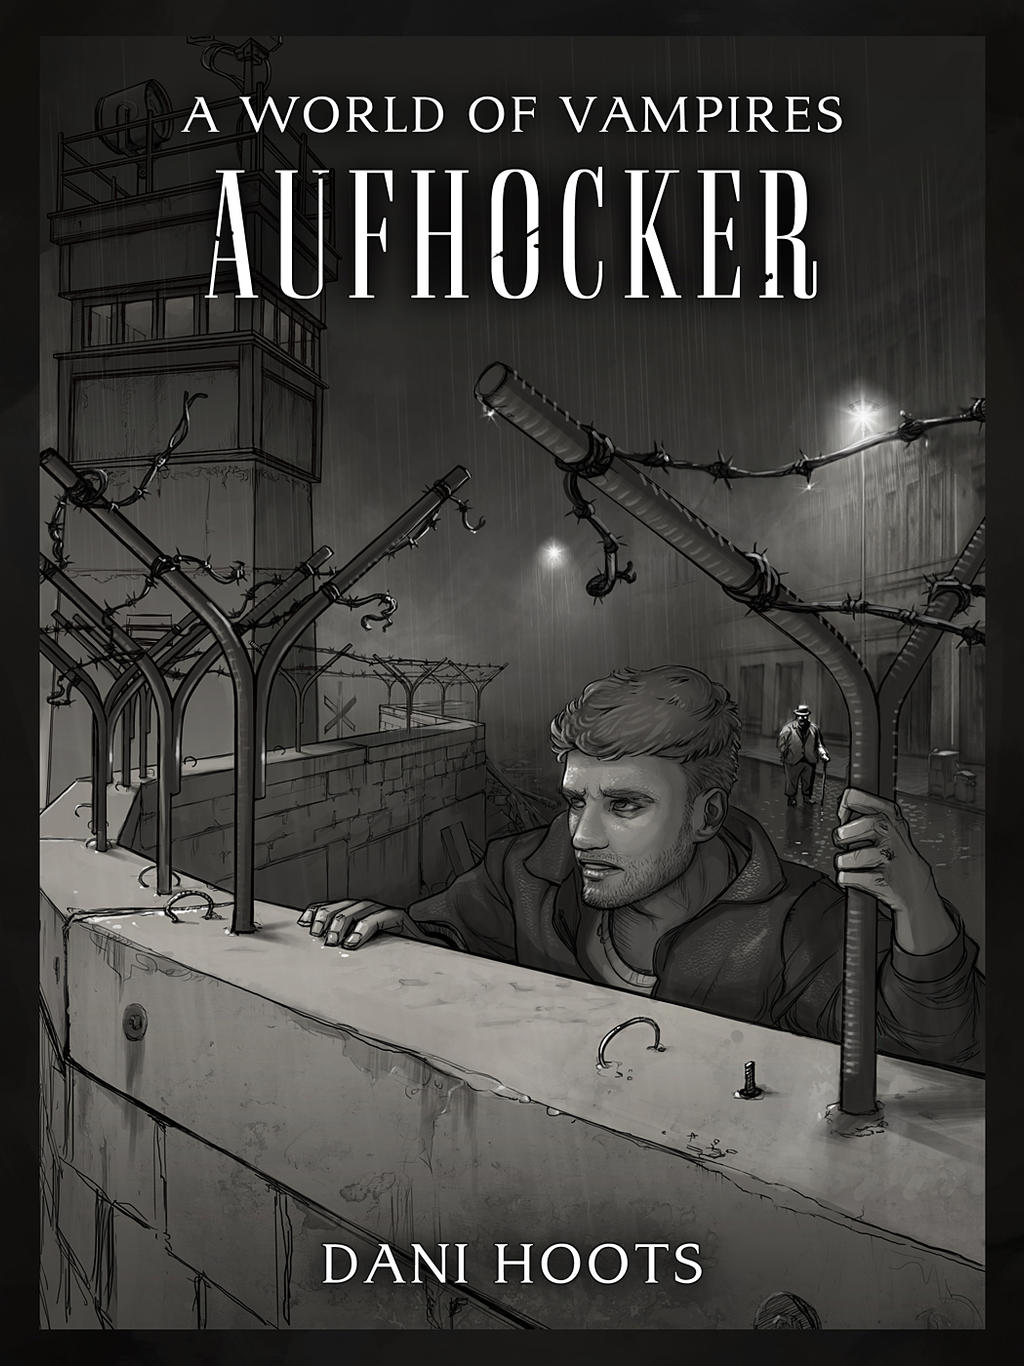 A World of Vampires: Aufhocker